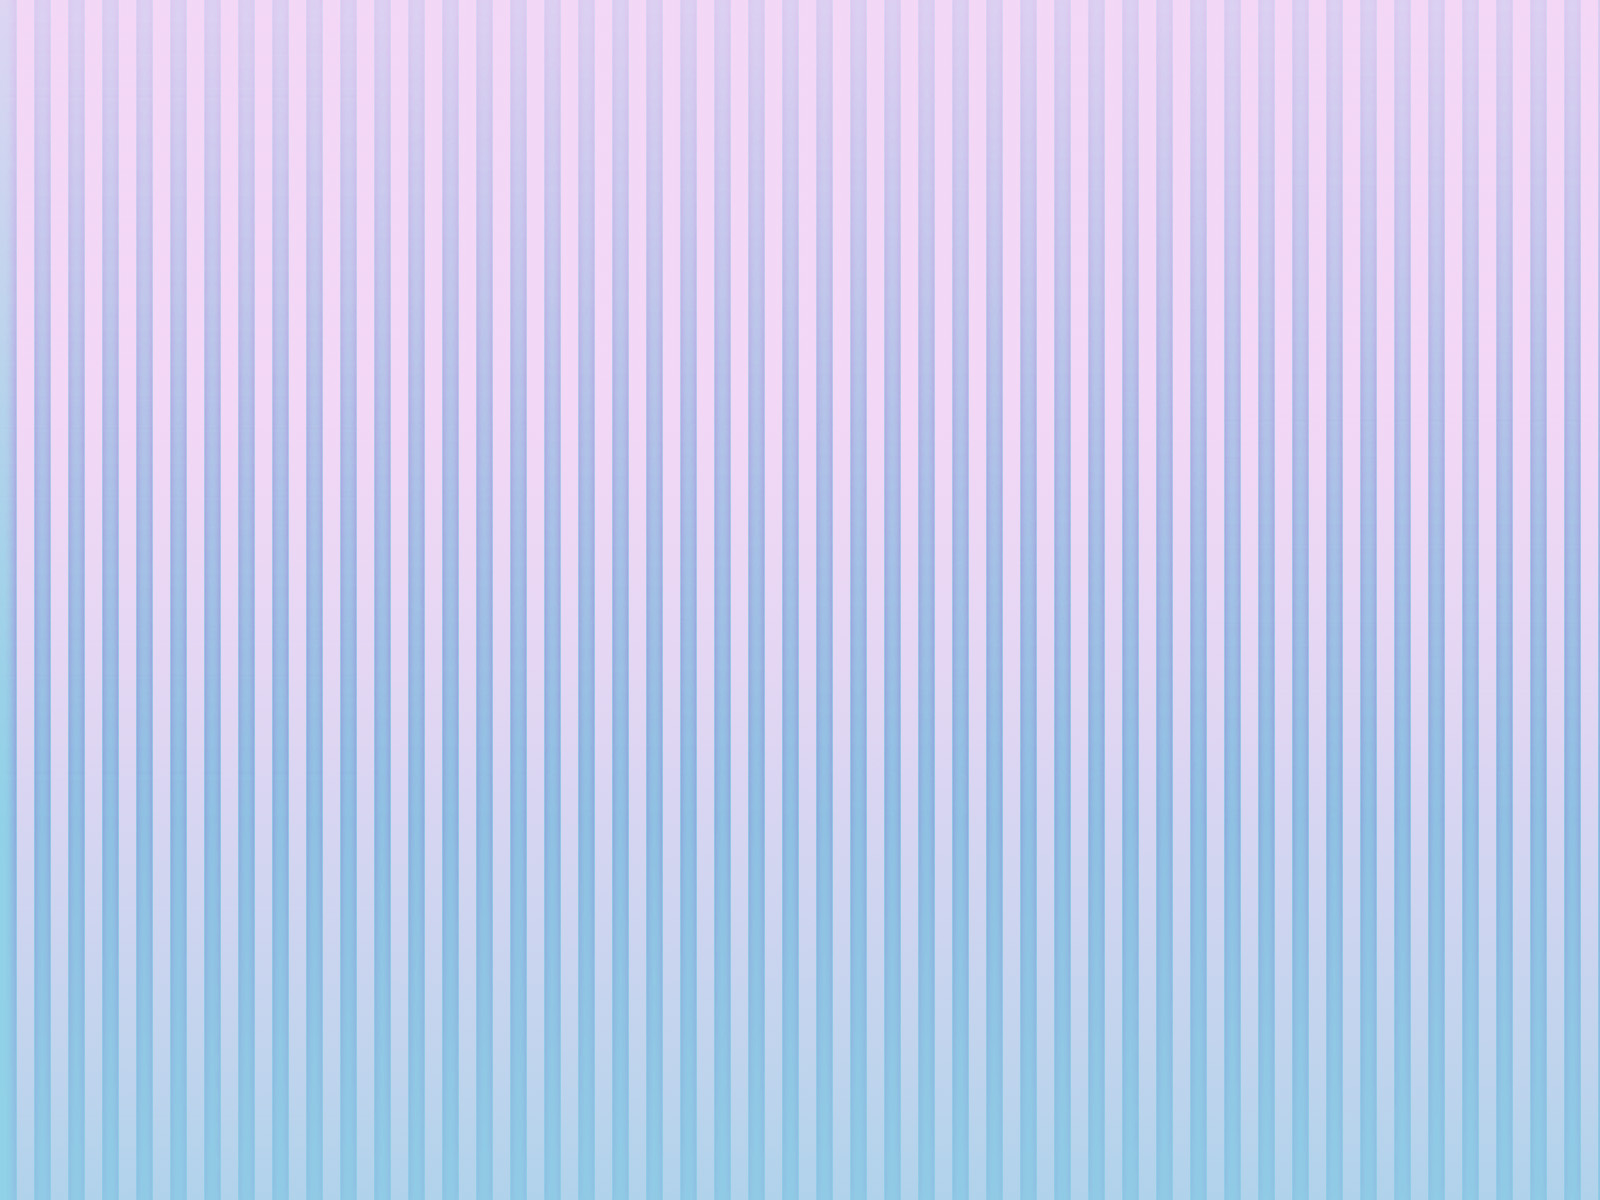 Pink pattern stripes - photo#20